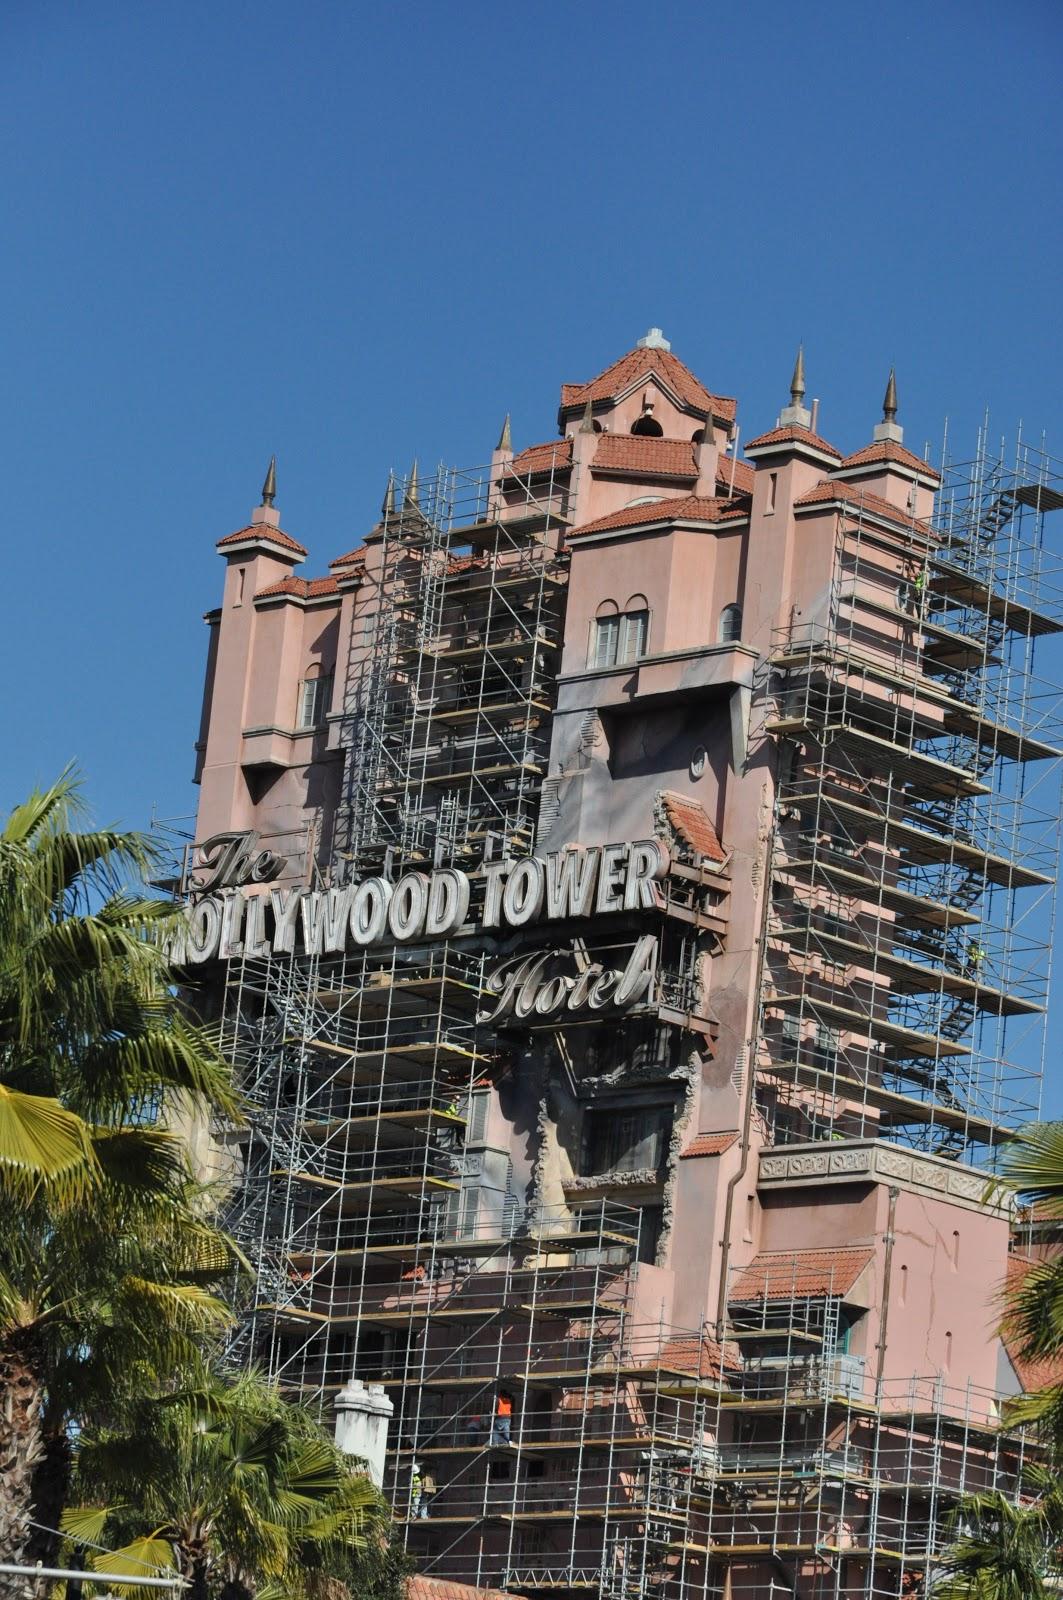 Disney Vacation Home: Hollywood Tower Hotel At Disney's